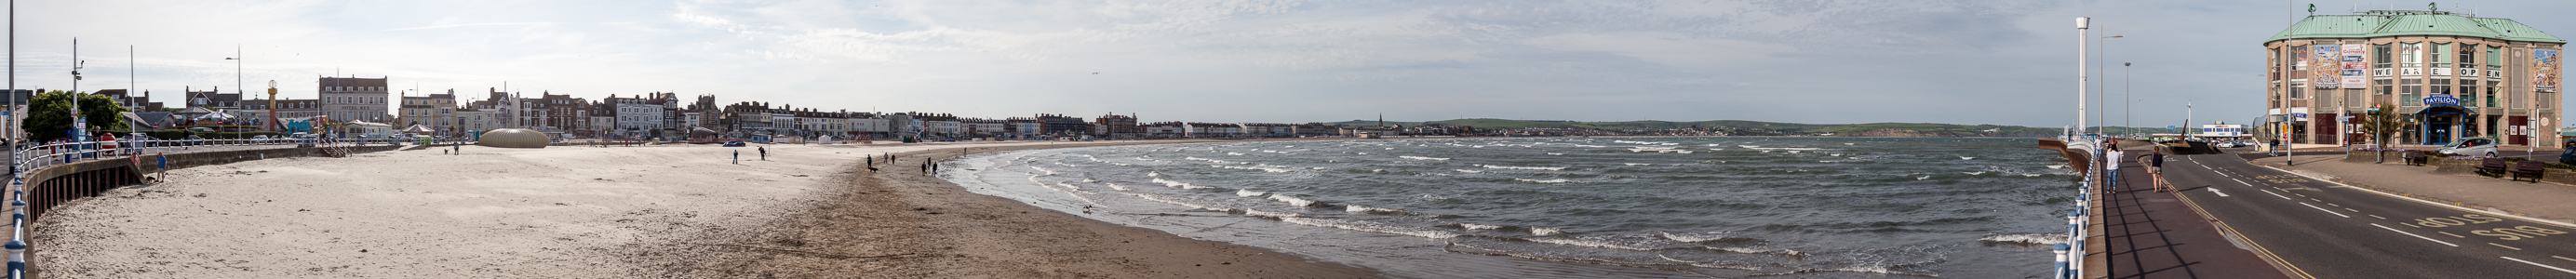 The Esplanade, Strand, Weymouth Bay, Ärmelkanal (English Channel), Weymouth Pavilion